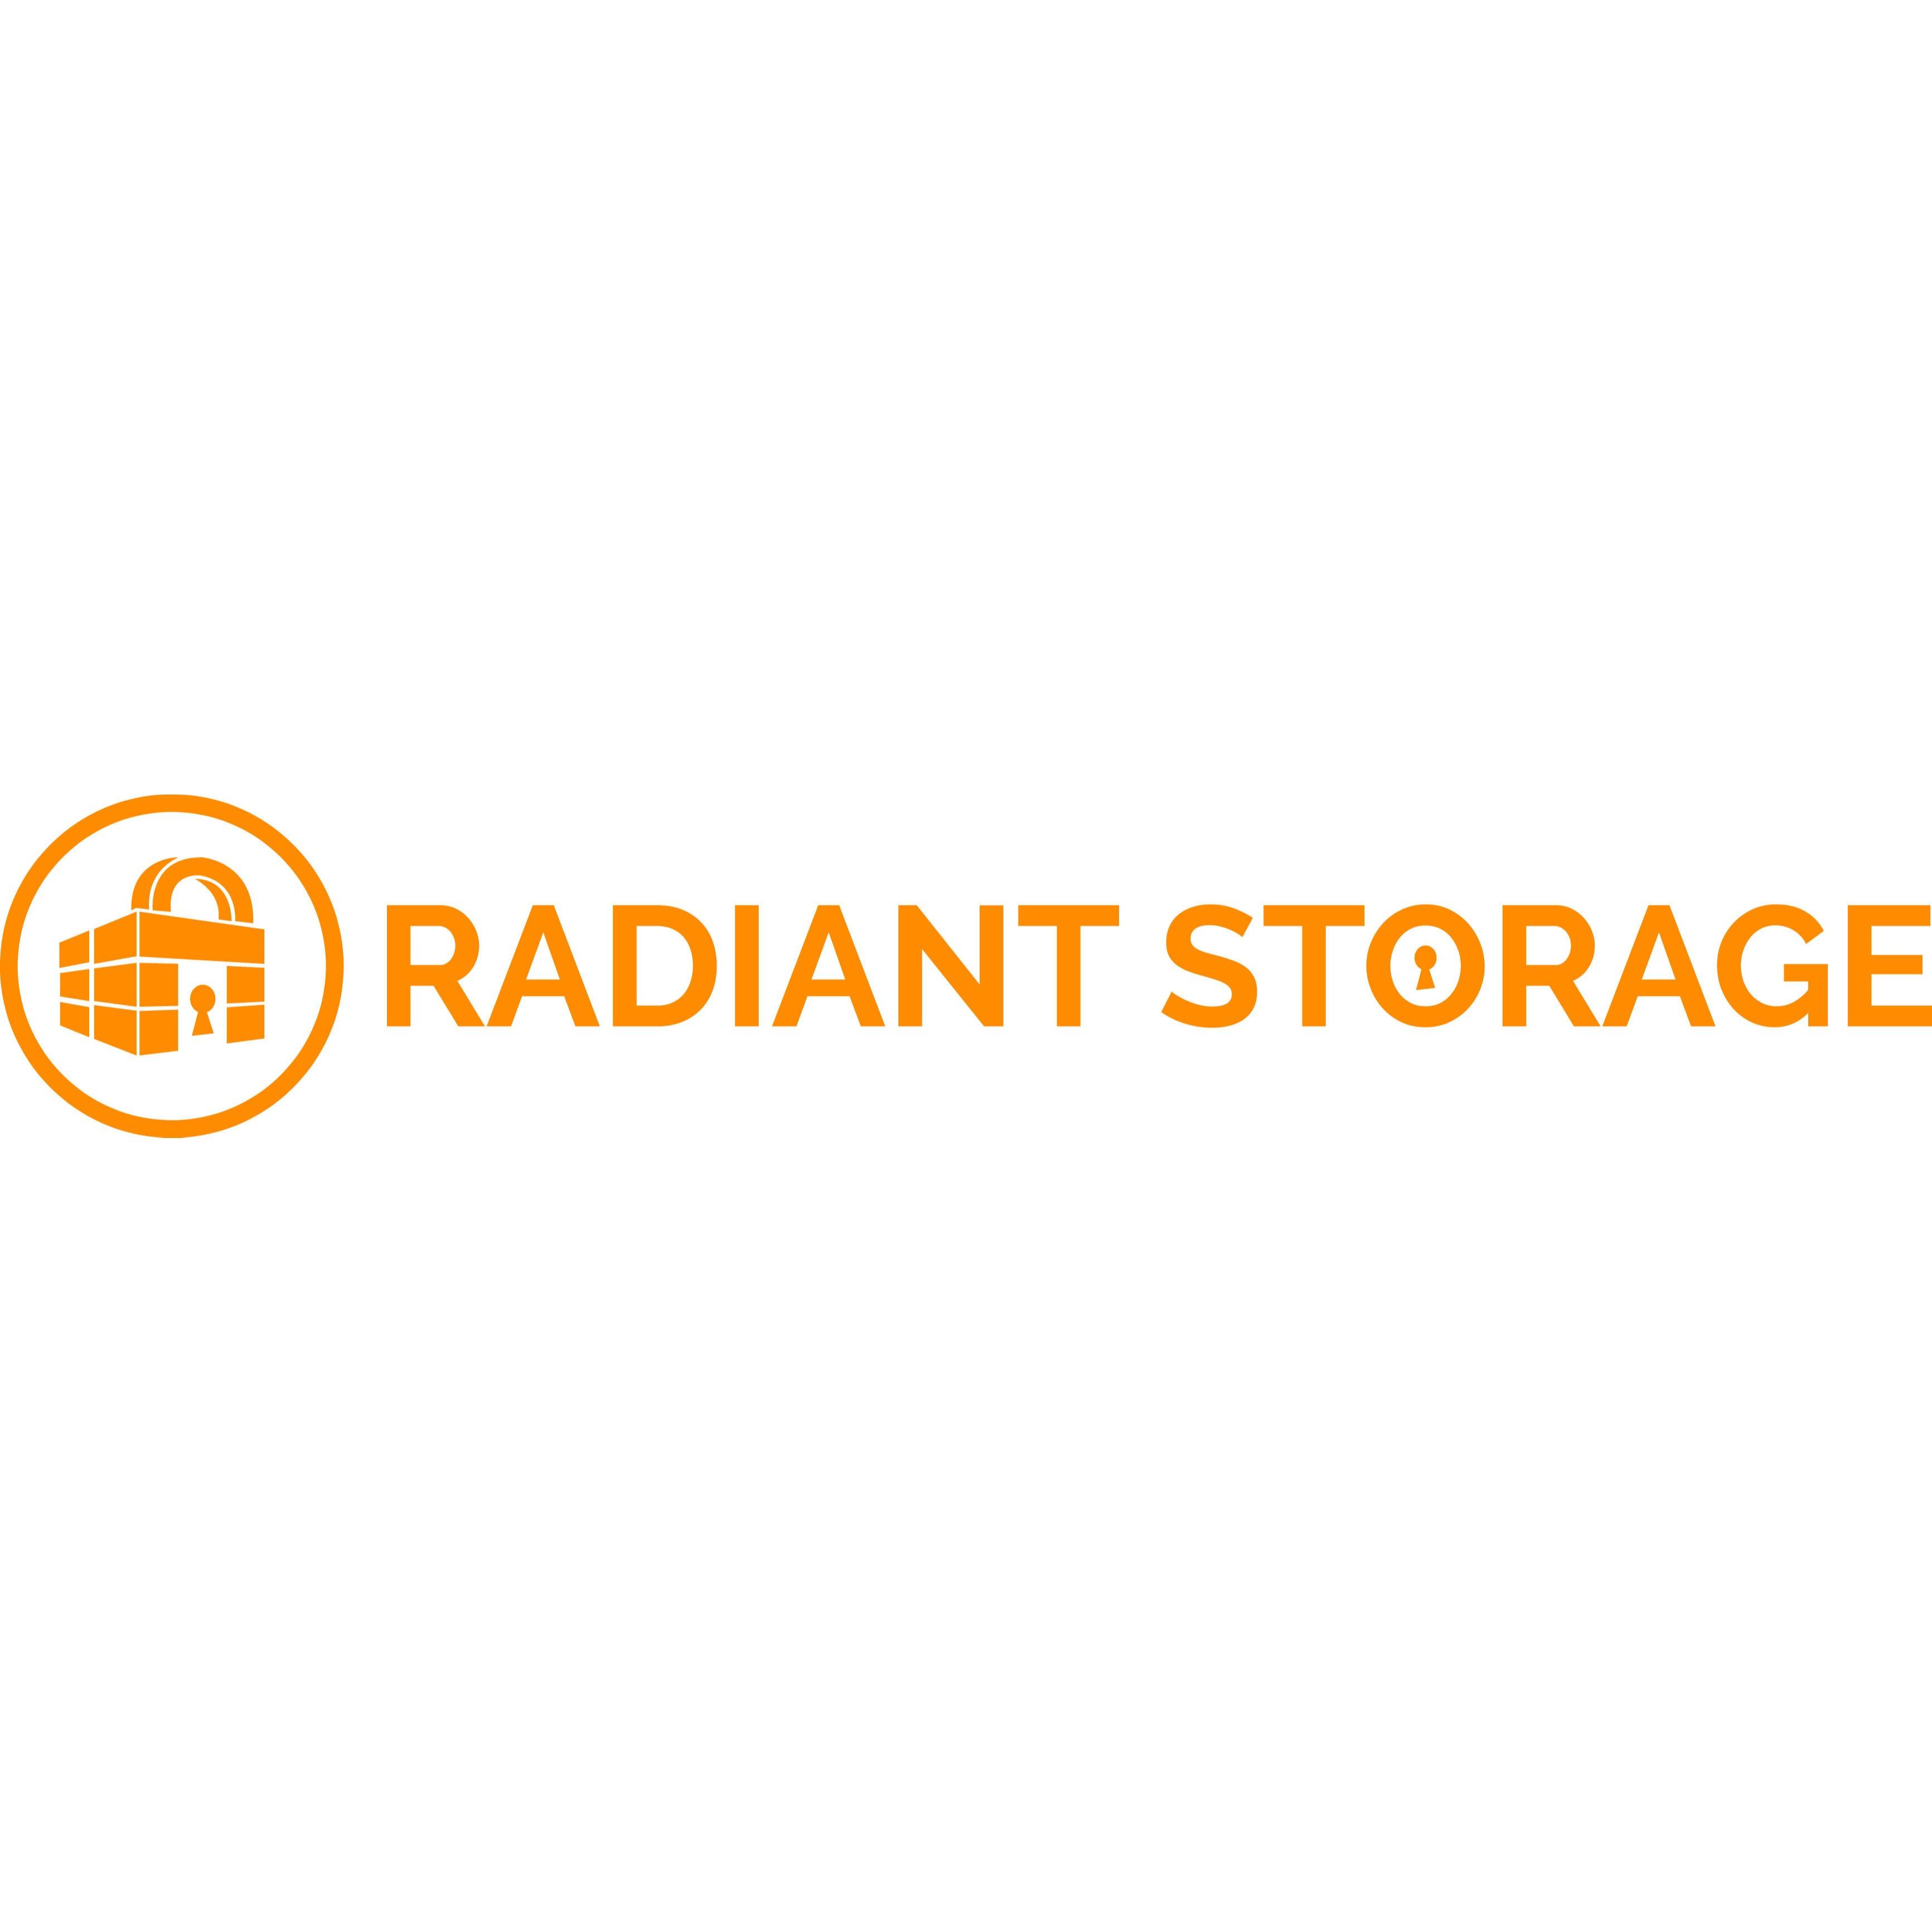 Radiant Storage